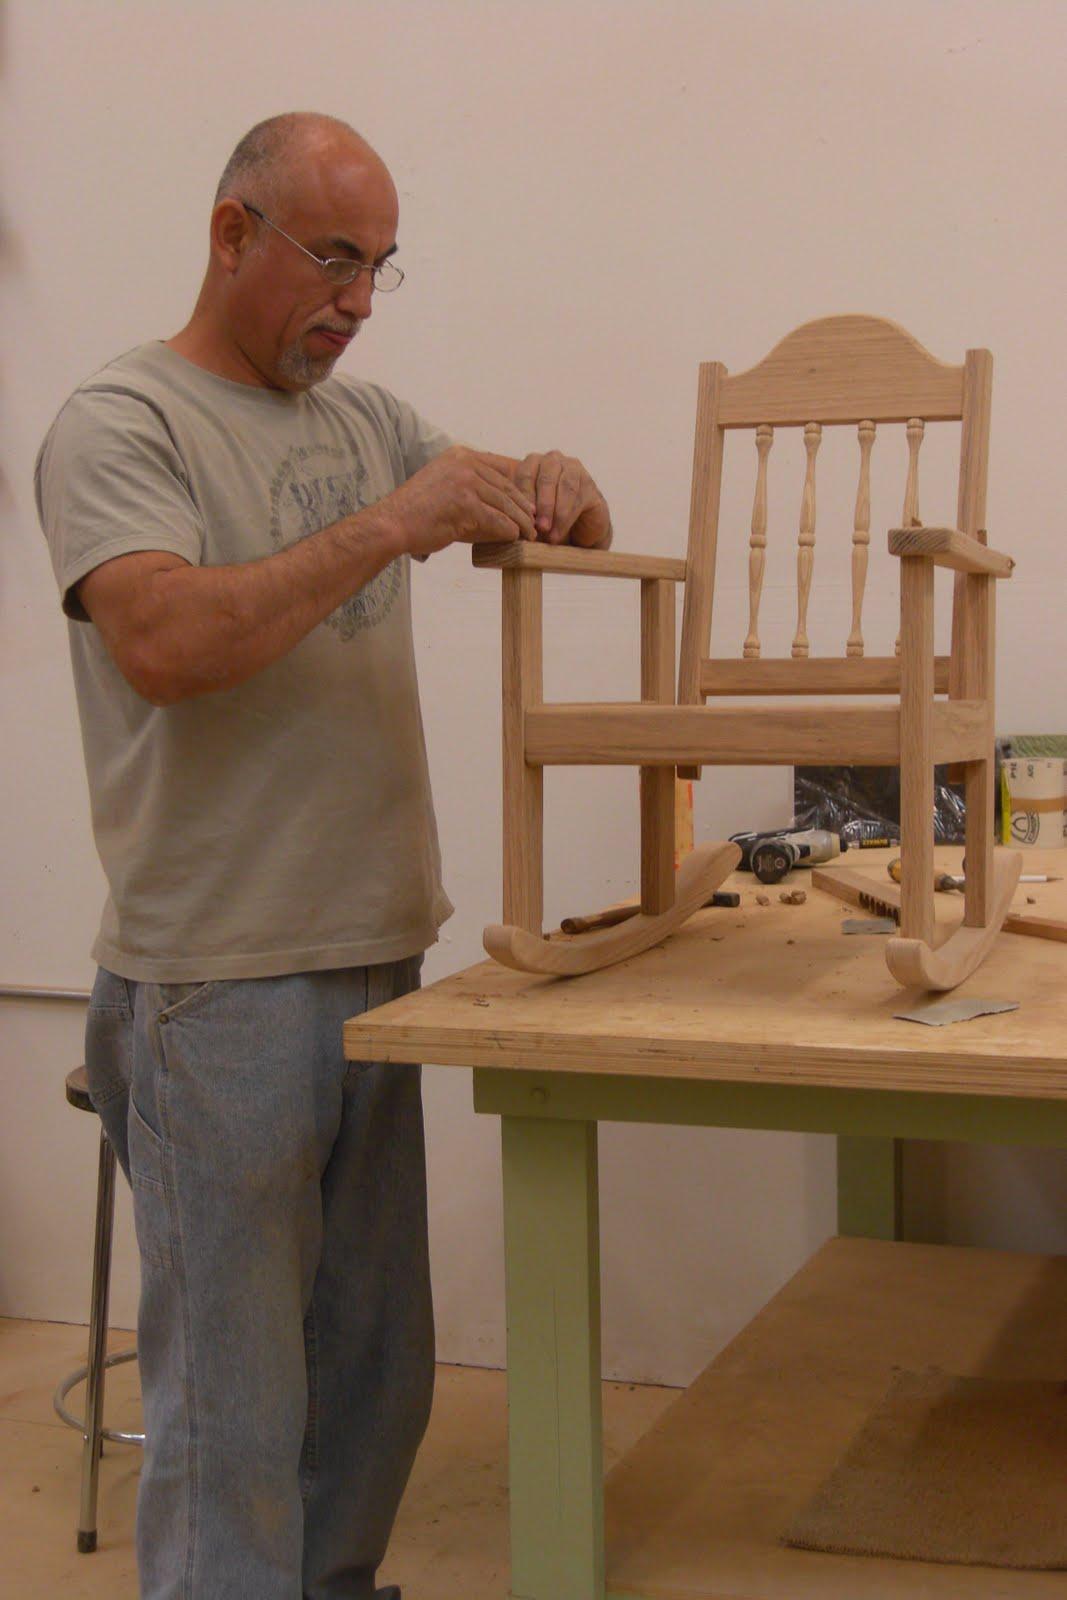 Rocking Chair Woodworking Plans Butterfly Covers Cotton Classes In Las Vegas: Course Descriptions